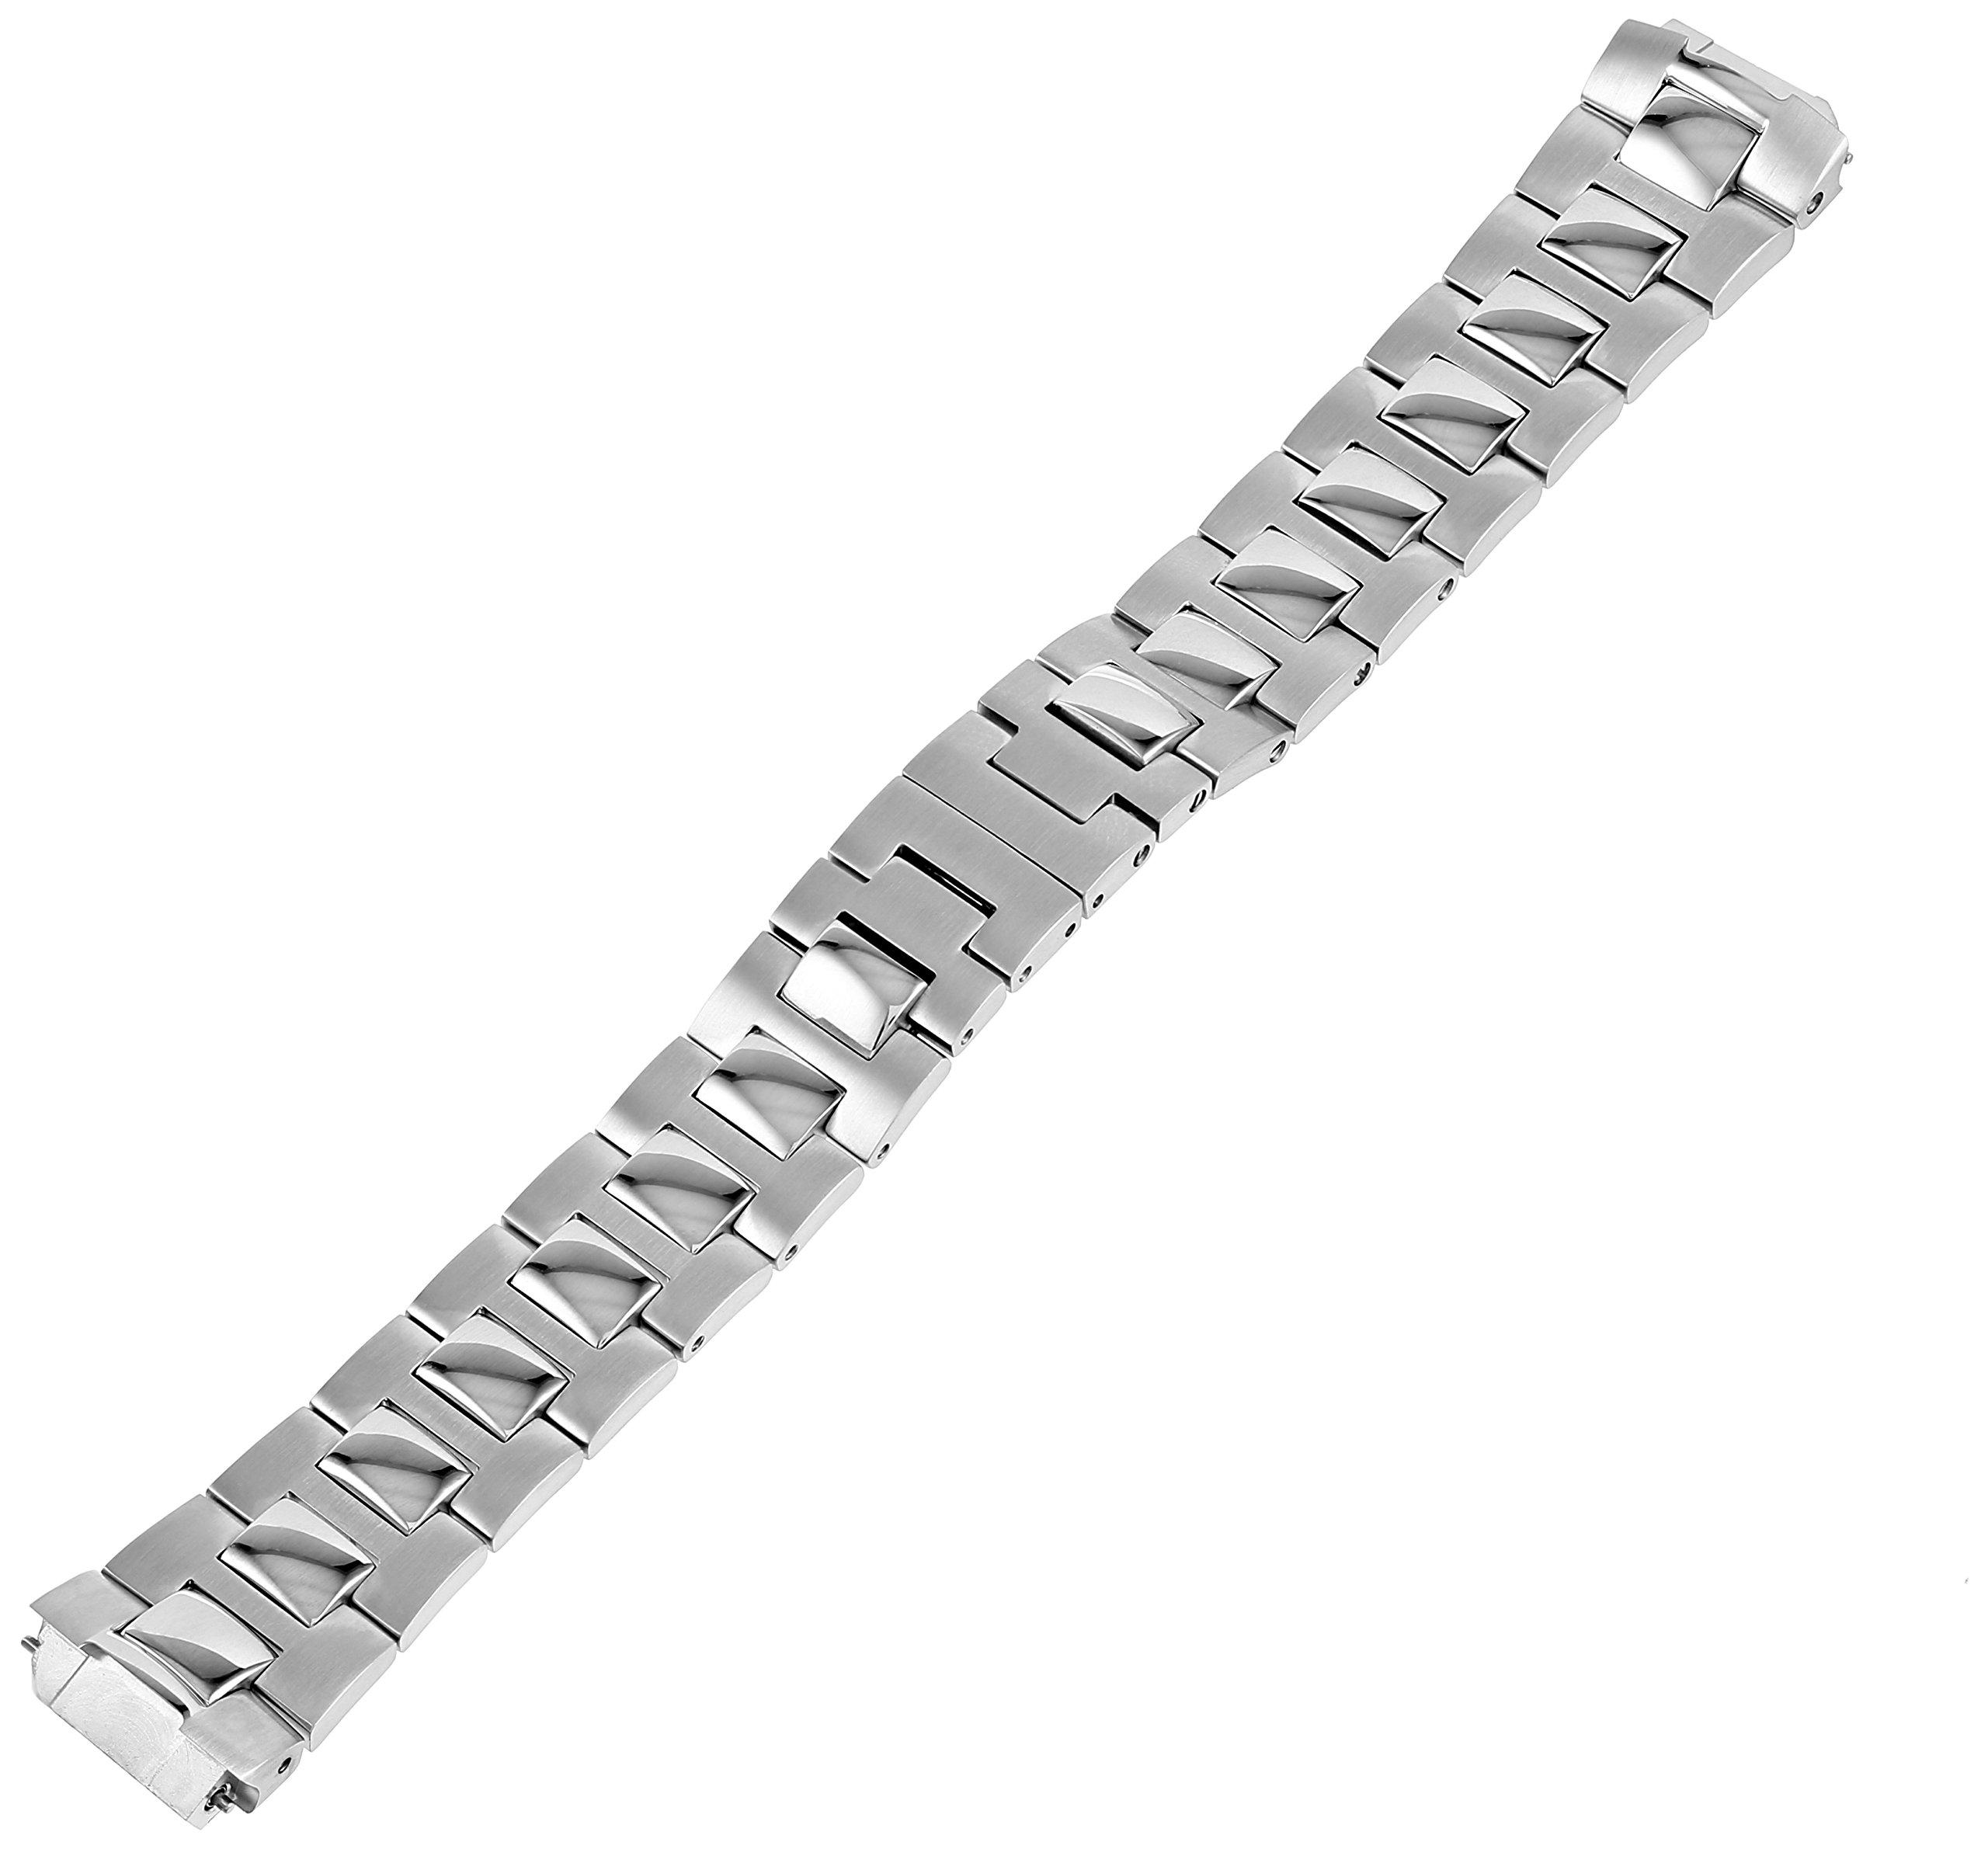 Philip Stein 1-SS3 18mm Stainless Steel Silver Watch Bracelet by Philip Stein (Image #1)